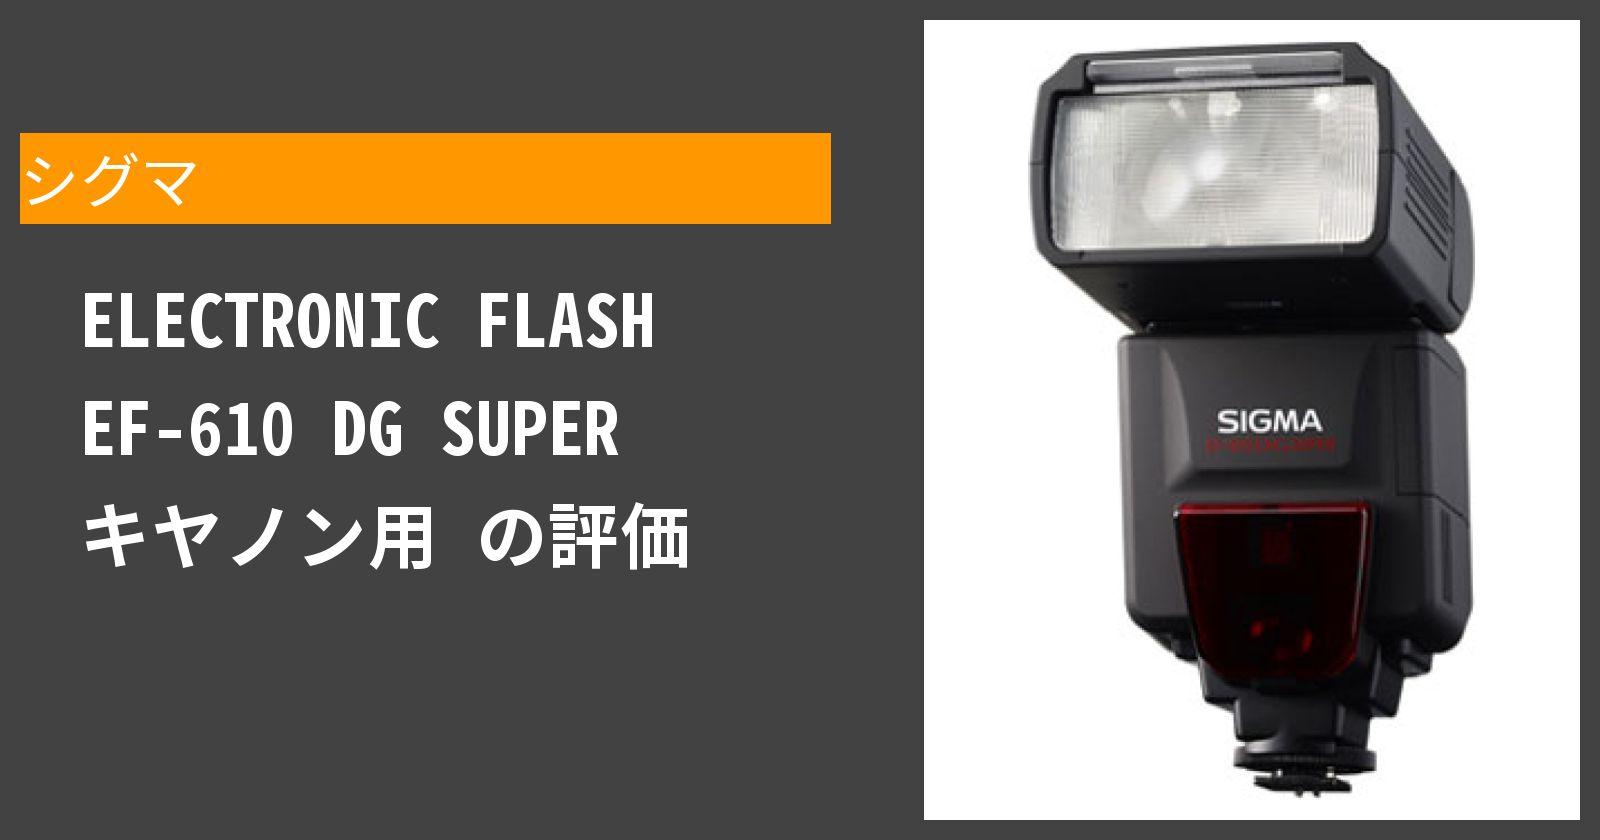 ELECTRONIC FLASH EF-610 DG SUPER キヤノン用を徹底評価